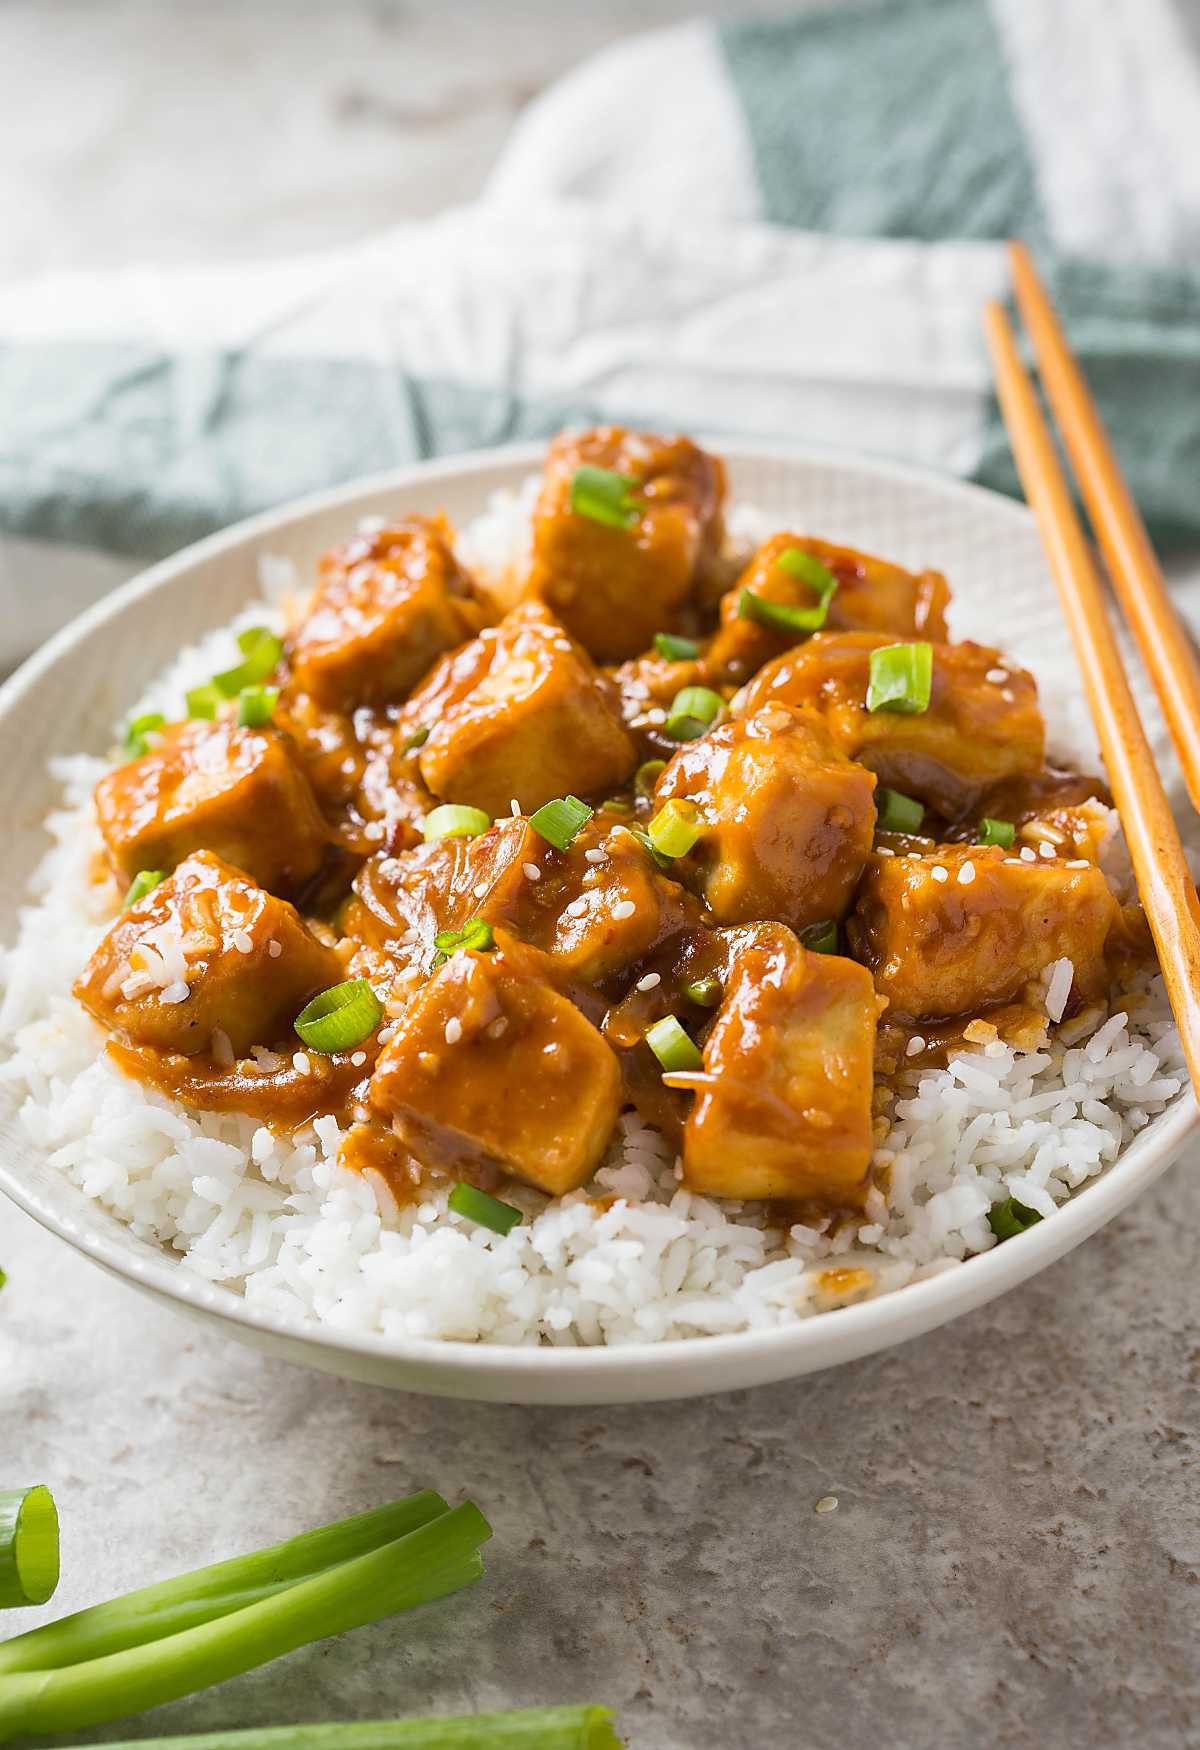 Simple Tofu Recipes  30 min Healthy Asian chili garlic tofu stir fry e Pan